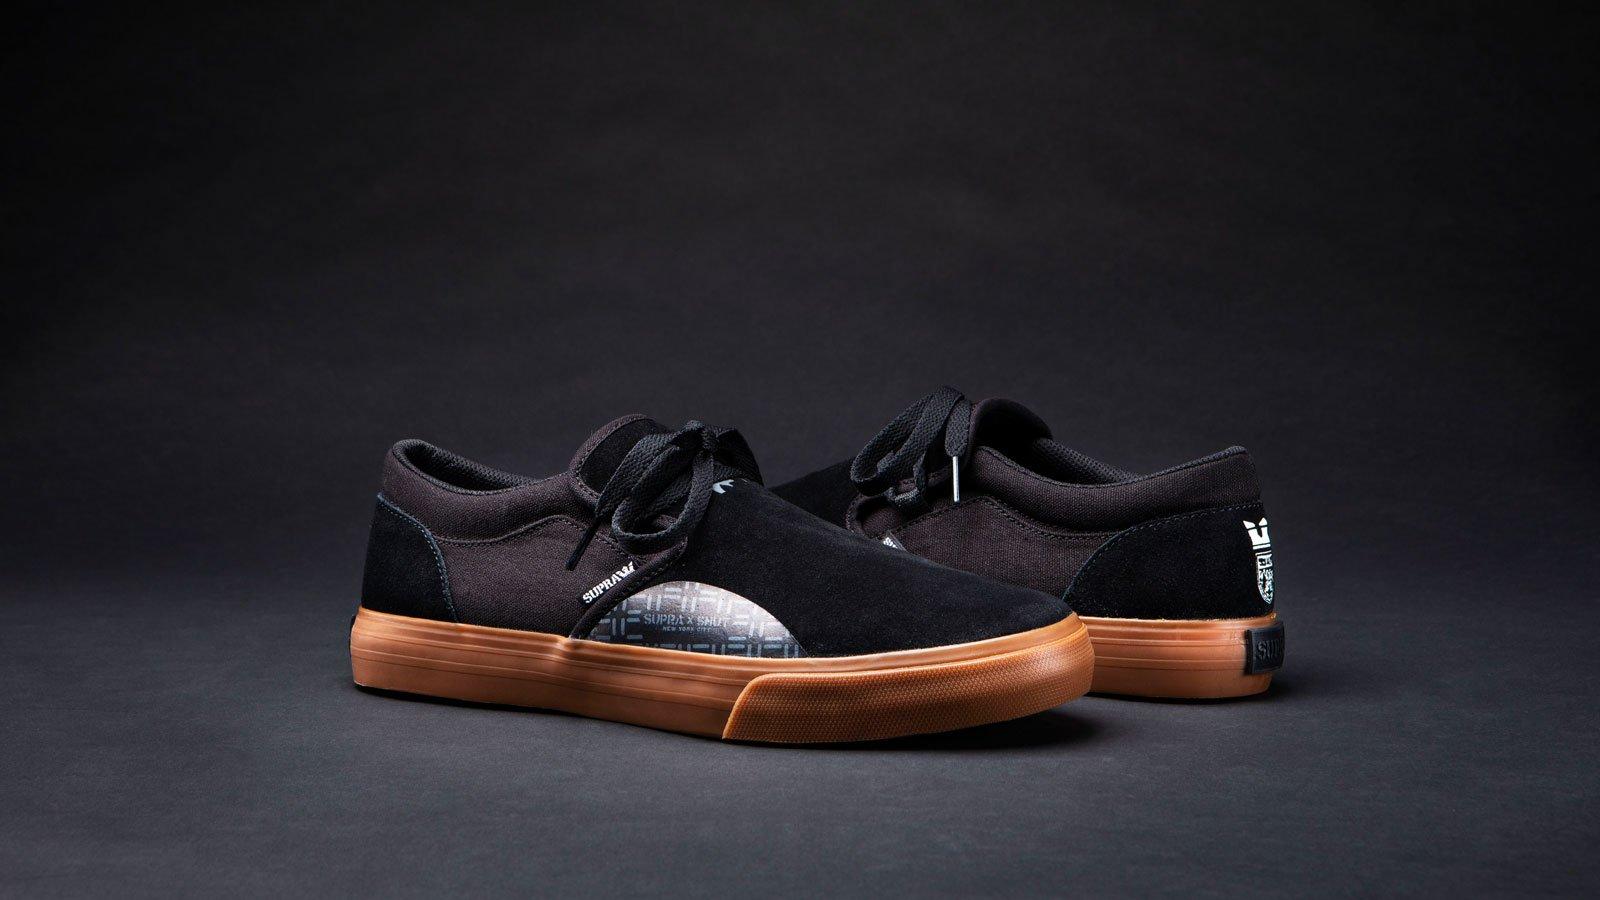 54506b2b14f SUPRA FW19/20 Men's Skate Shoes Preview - Boardsport SOURCE